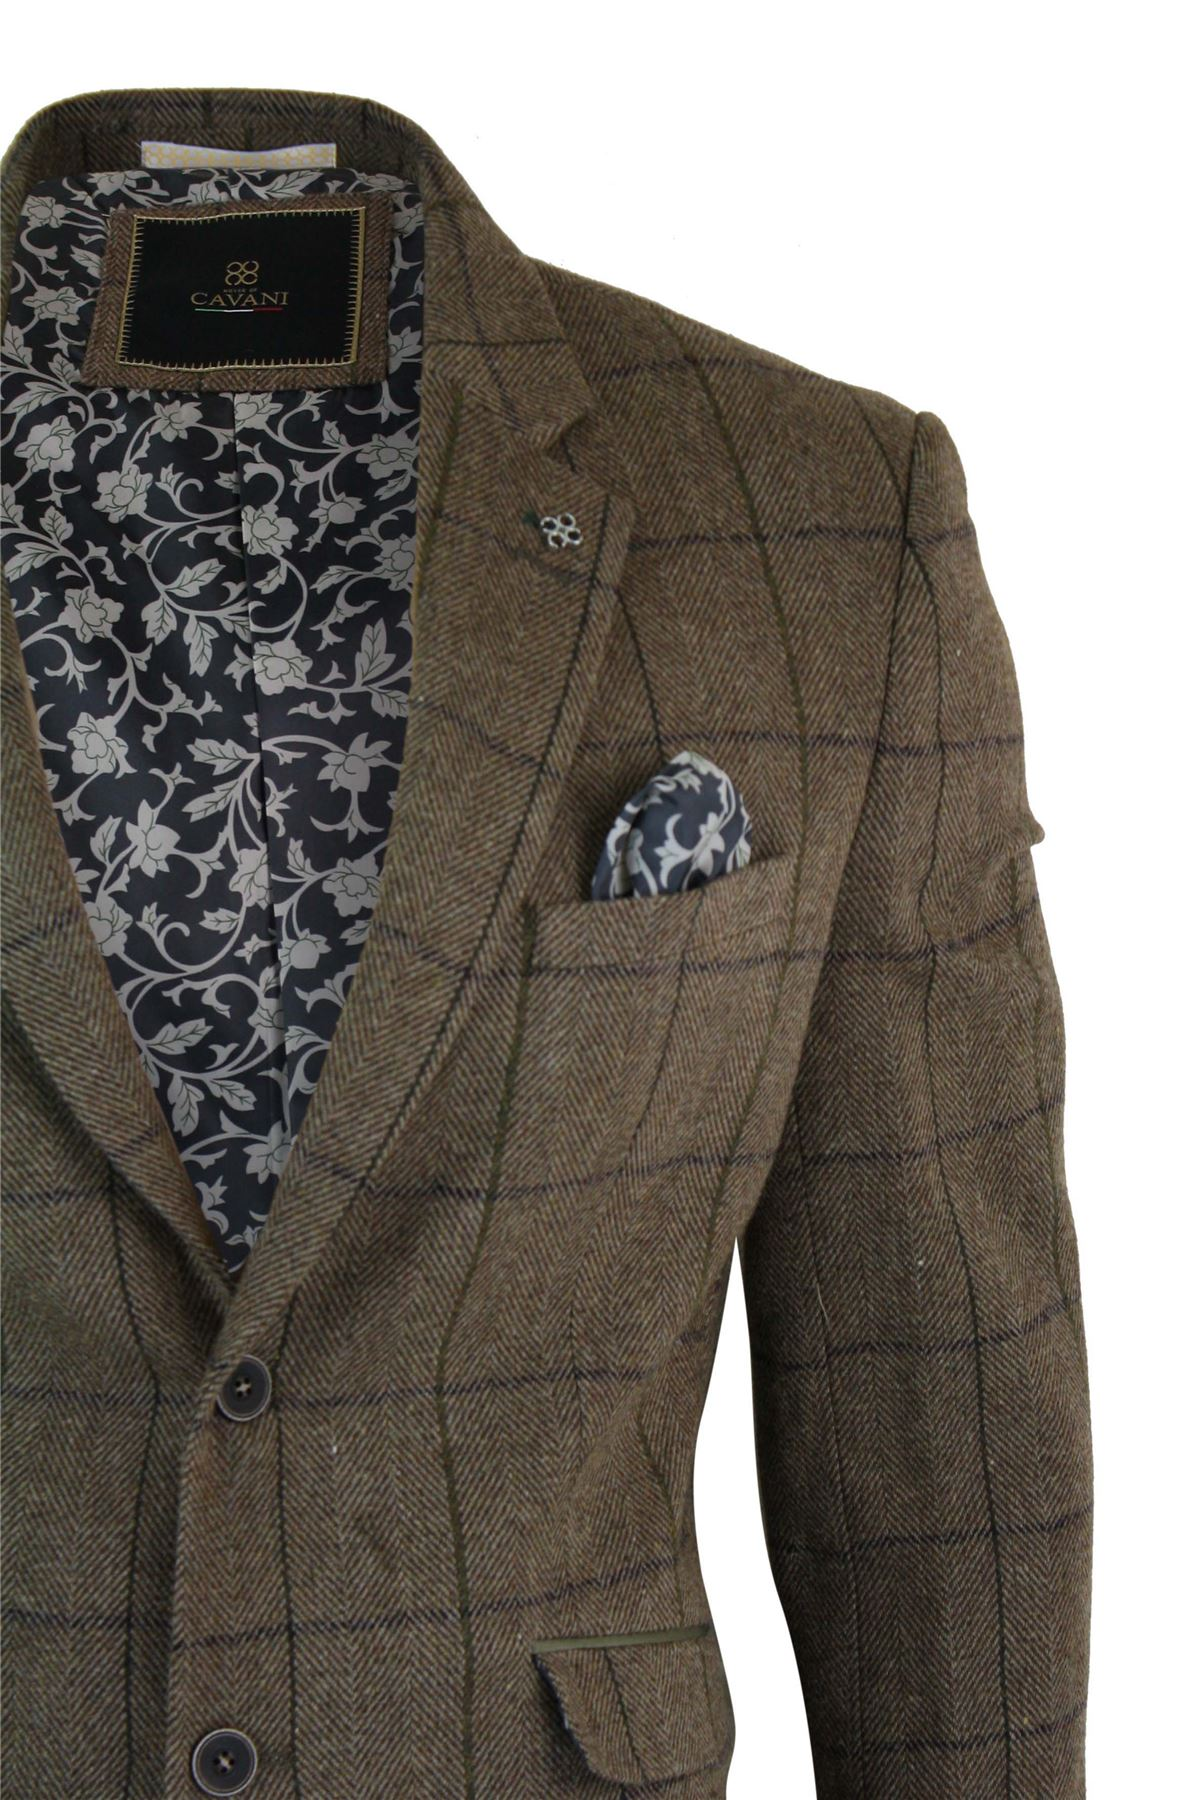 40 Best VESTE HOMME TWEED images | Menswear, Mens fashion:__cat__, Jackets